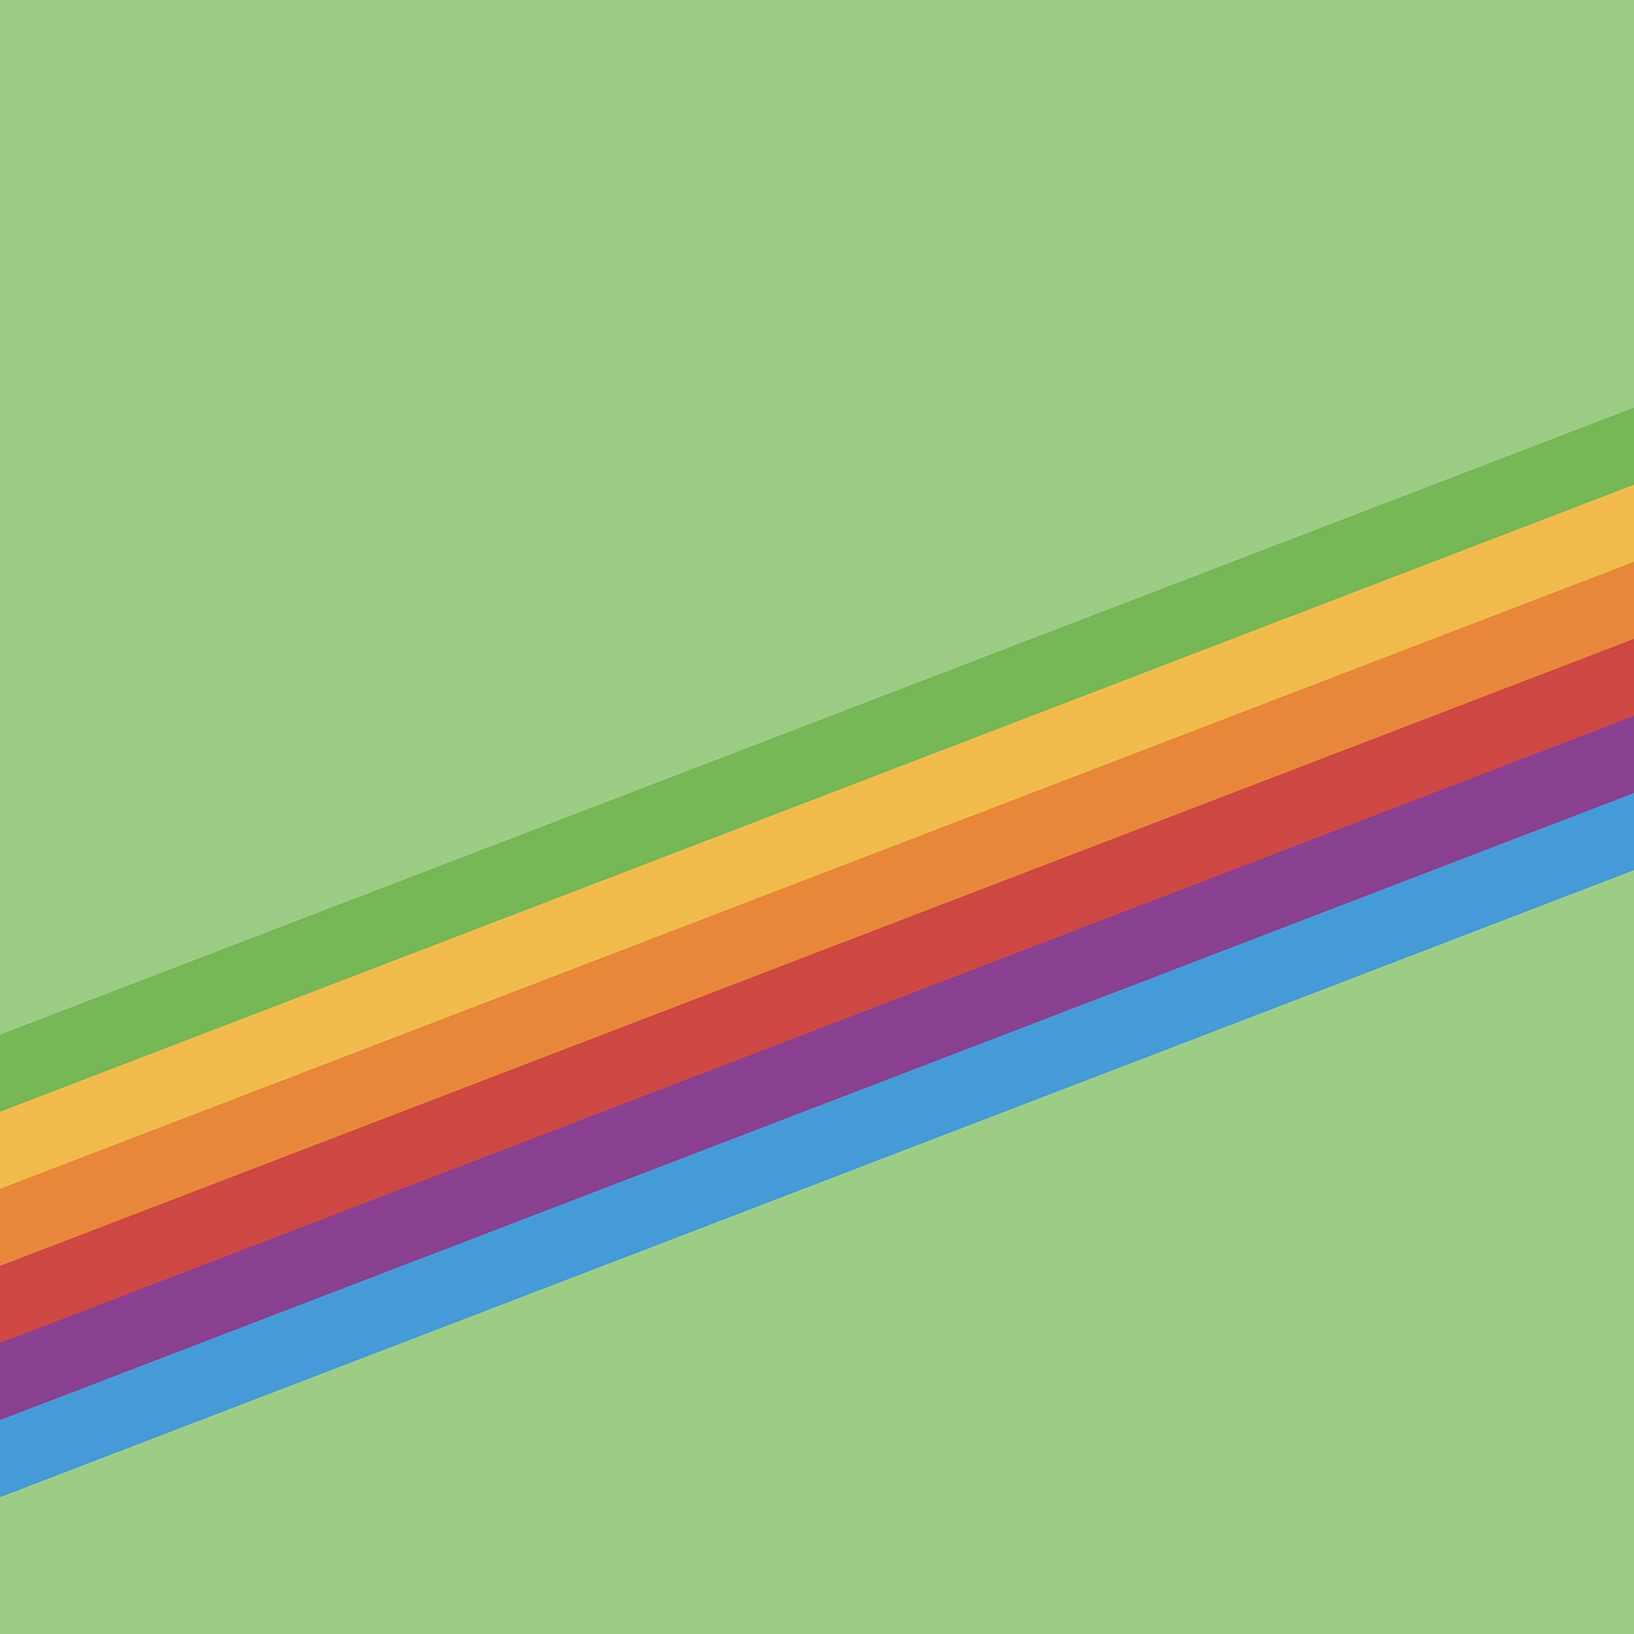 iOS_11_GM_Wallpaper_Heritage-Stripe-Green